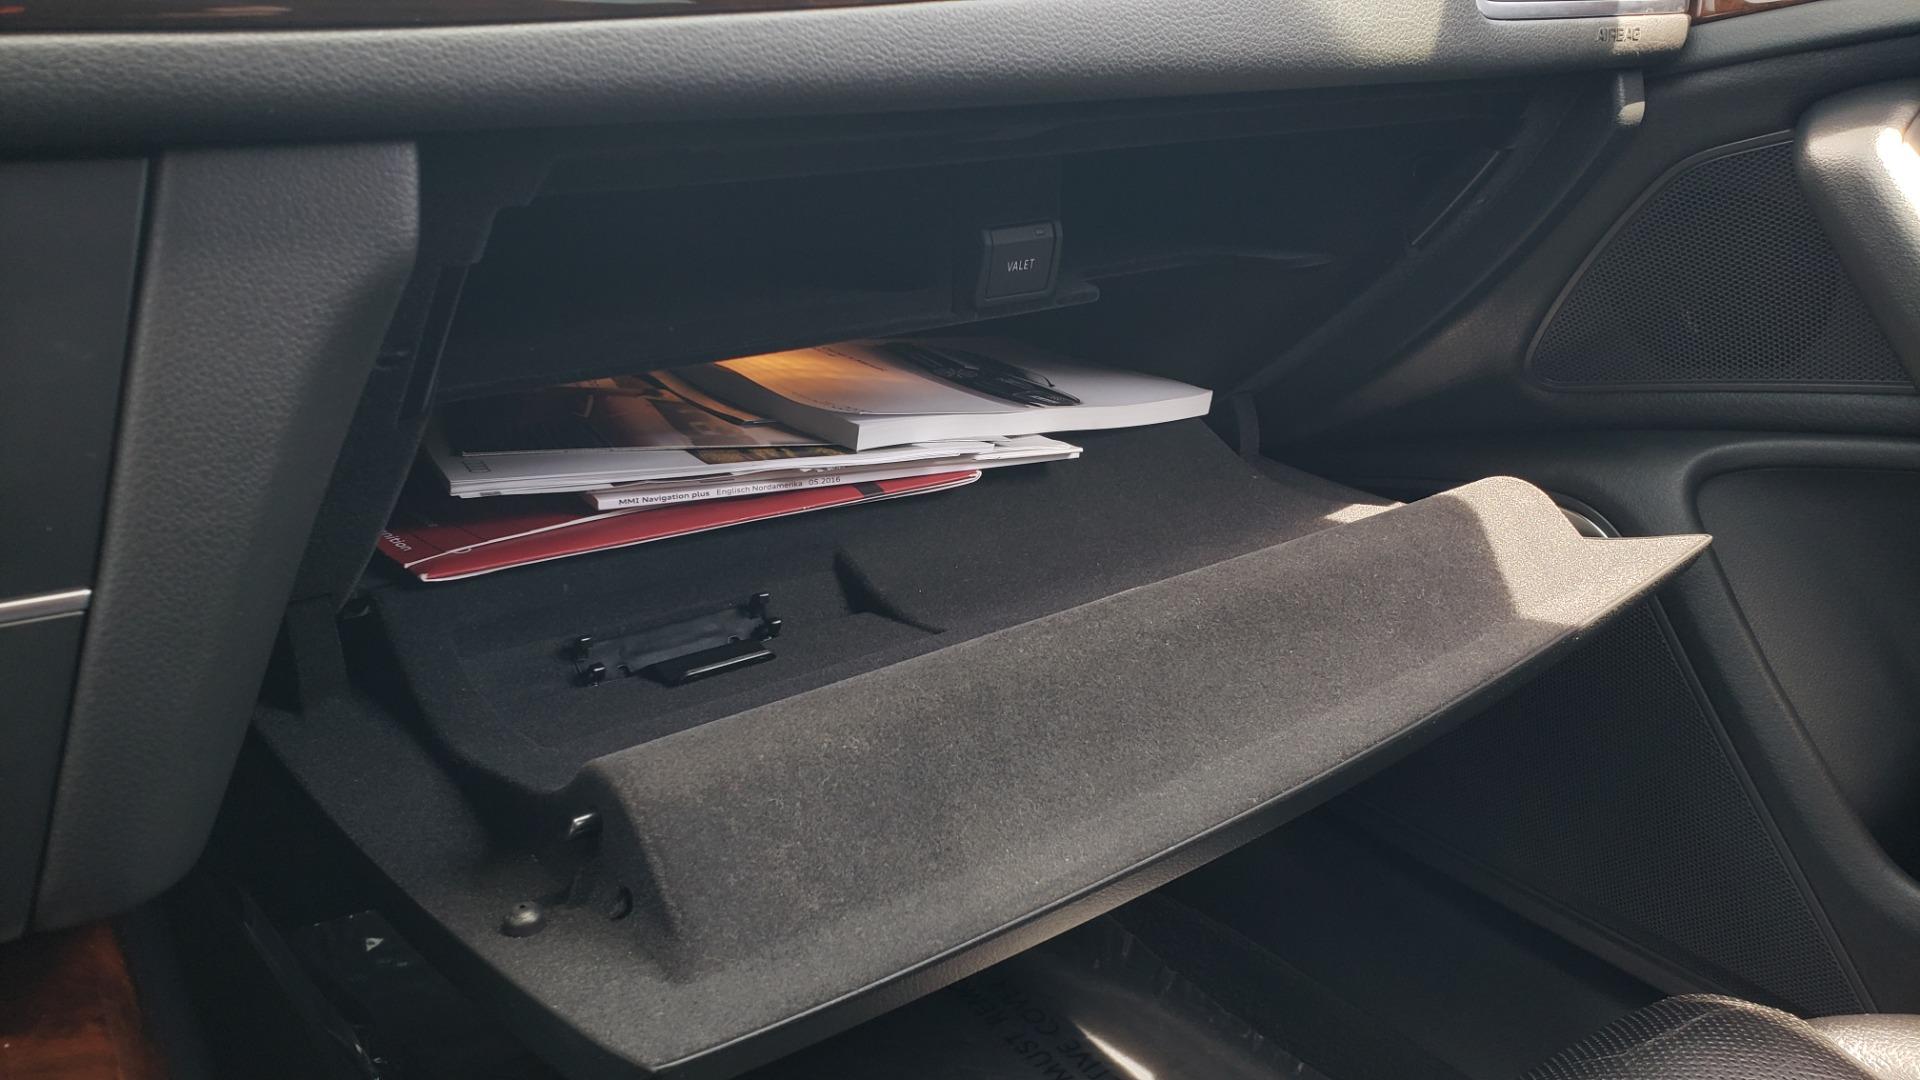 Used 2017 Audi A6 PRESTIGE SEDAN 3.0T / NAV / SUNROOF / BLACK OPTIC / CLD WTHR / REARVIEW for sale $30,797 at Formula Imports in Charlotte NC 28227 54